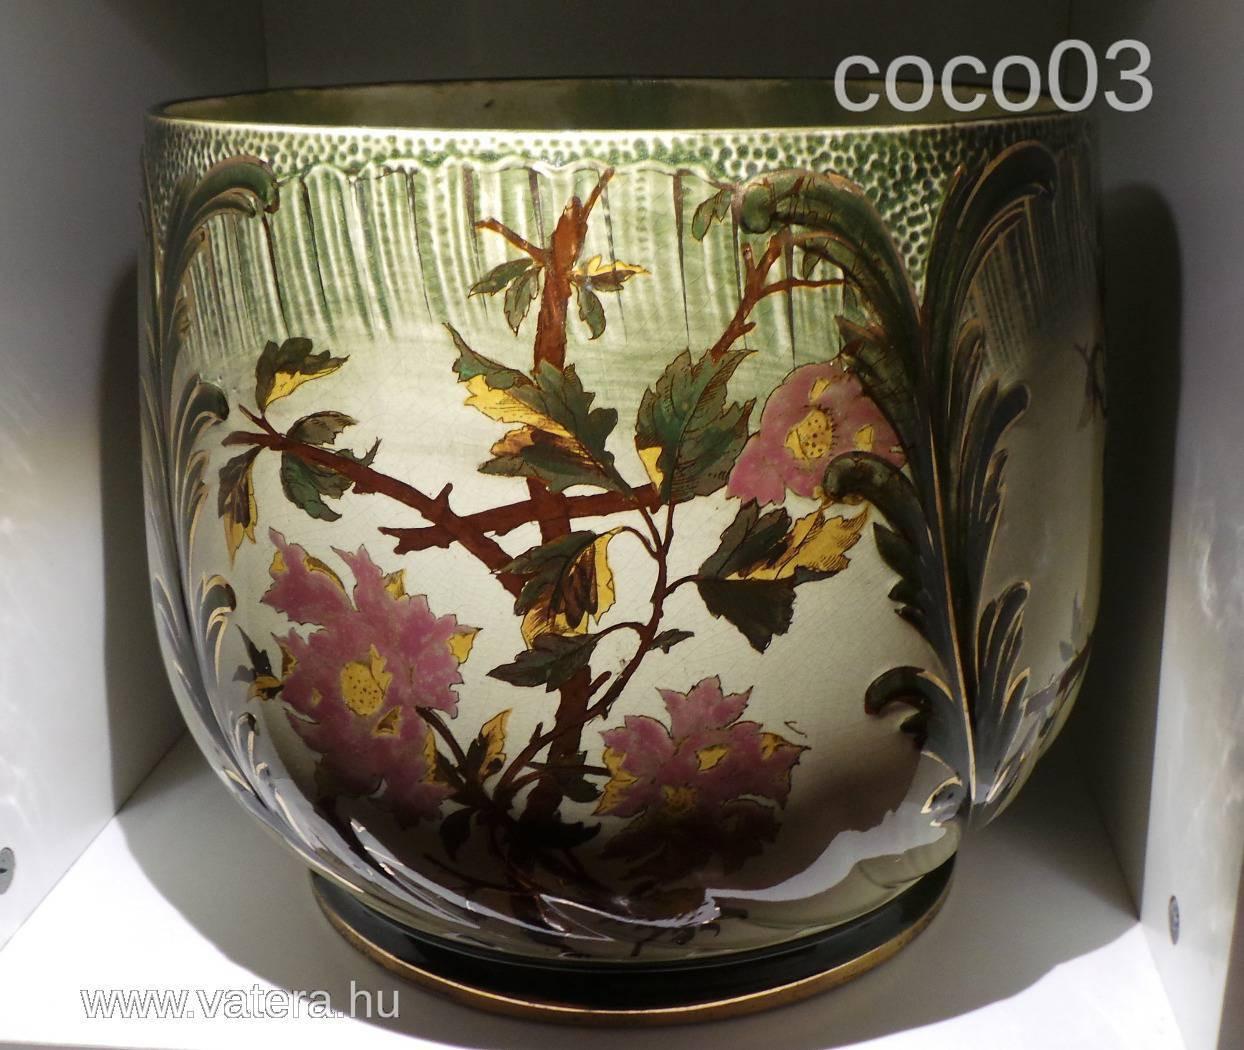 royal bonn vase of 1 ft os kikialtasi arral indula³ termakek vatera online piactar regarding a5f9 1 big